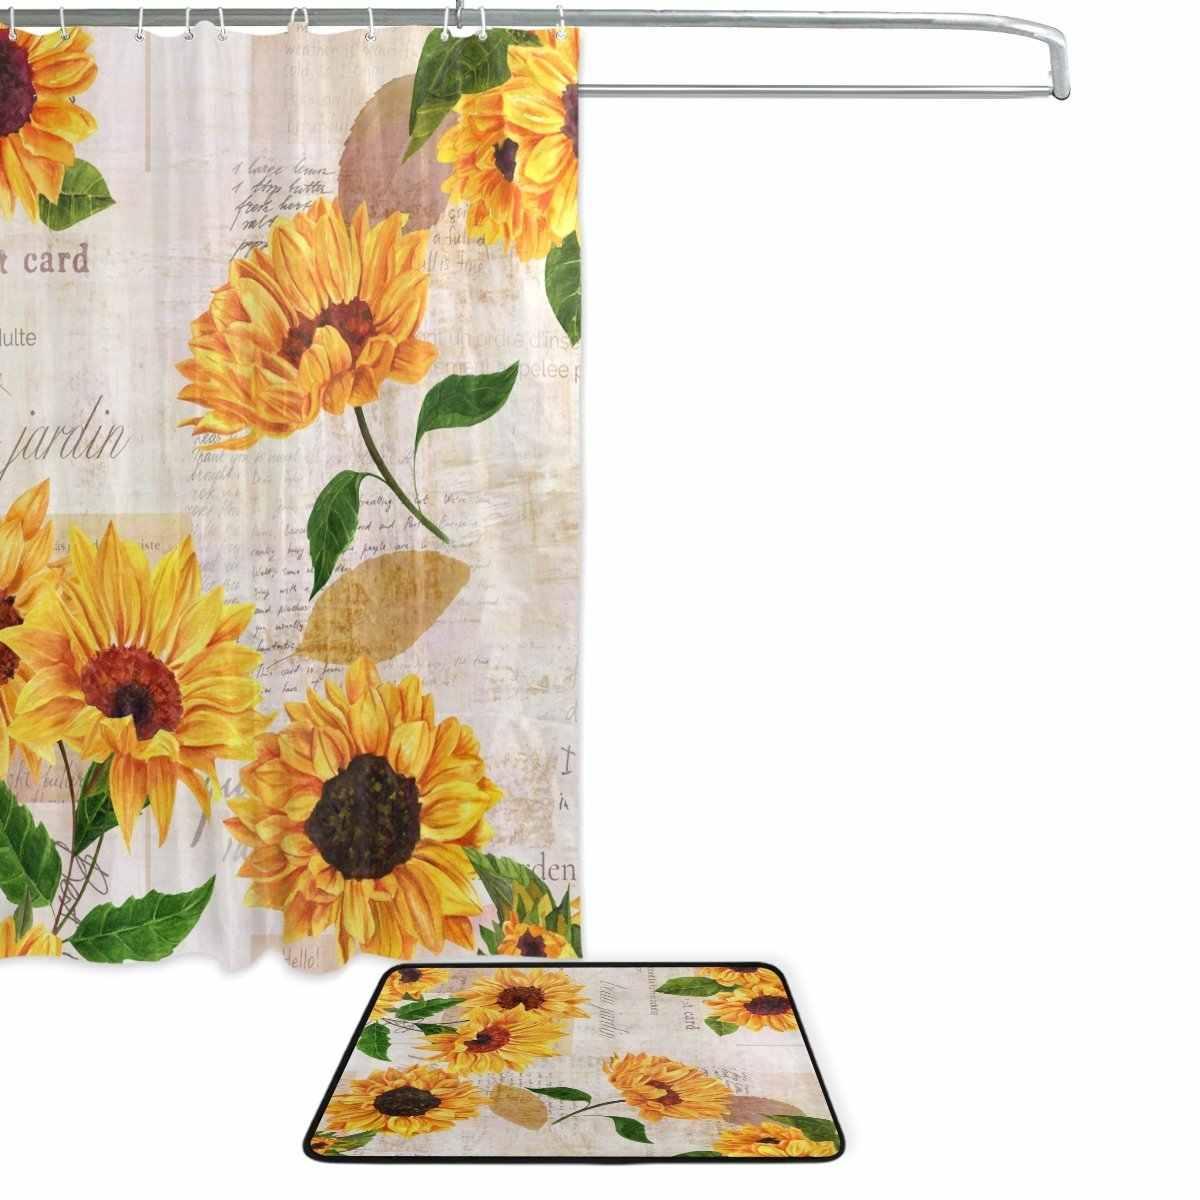 Summer Sunflower Shower Curtain And Mat Set Vintage Retro Floral Waterproof Fabric Bathroom Curtain